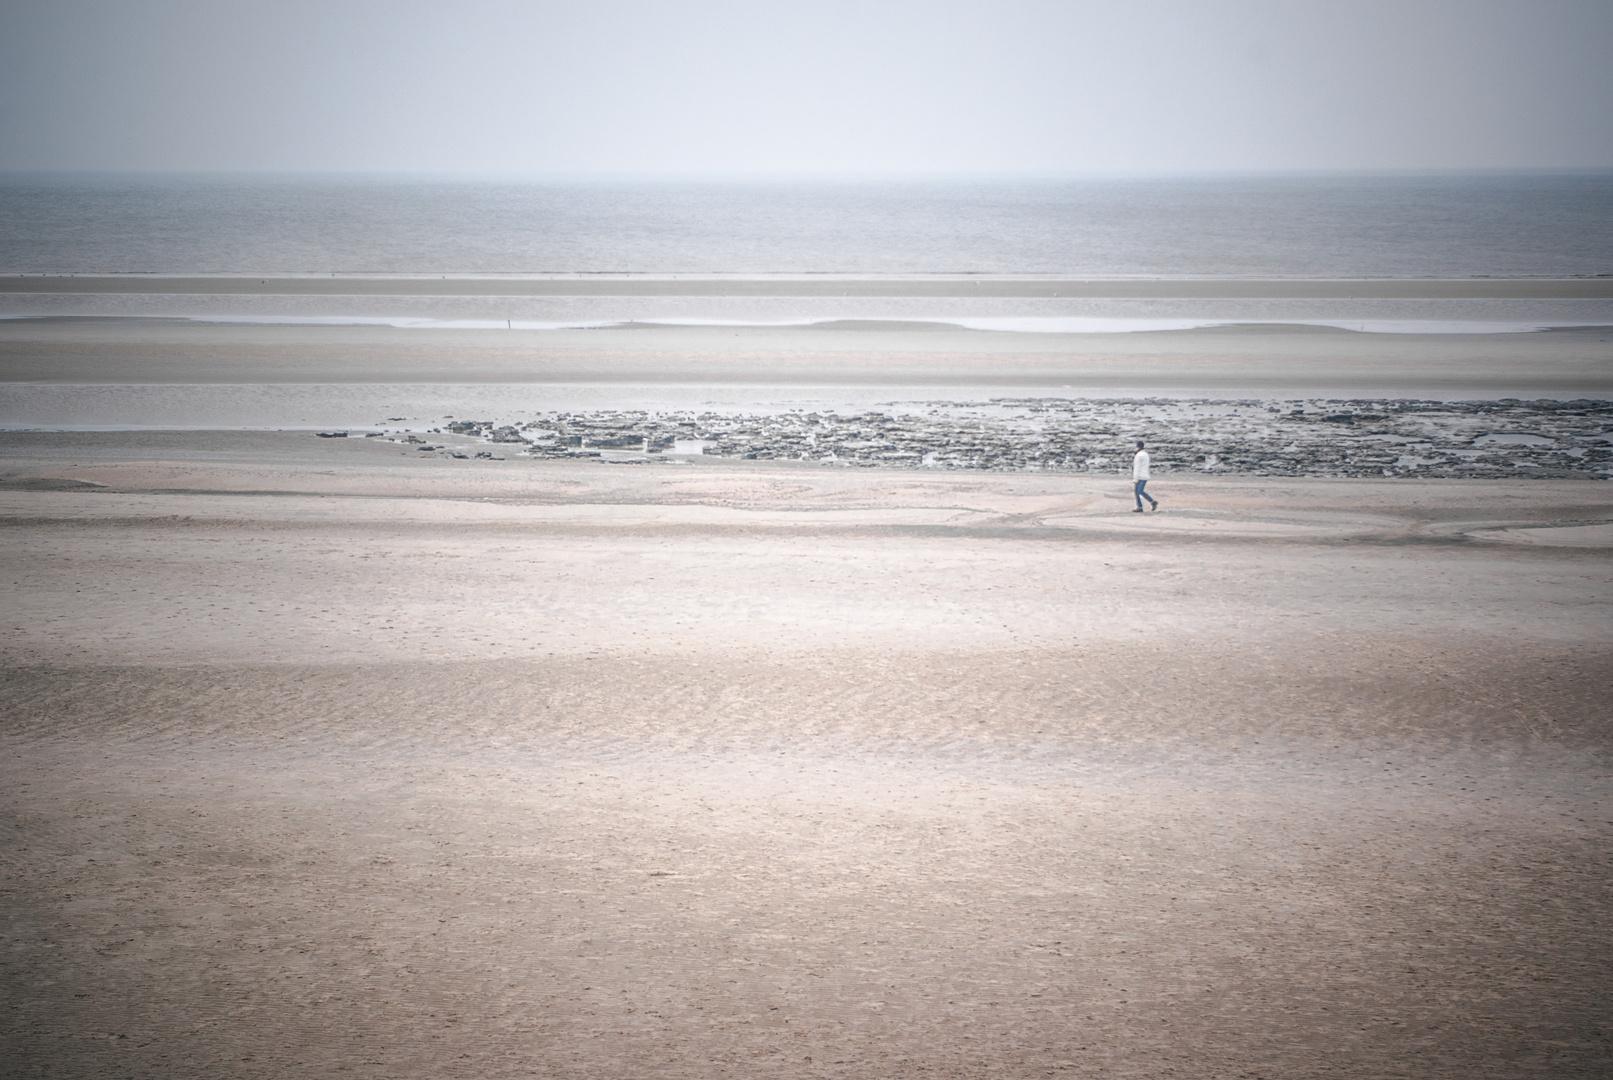 Windiger Strandspaziergang IV